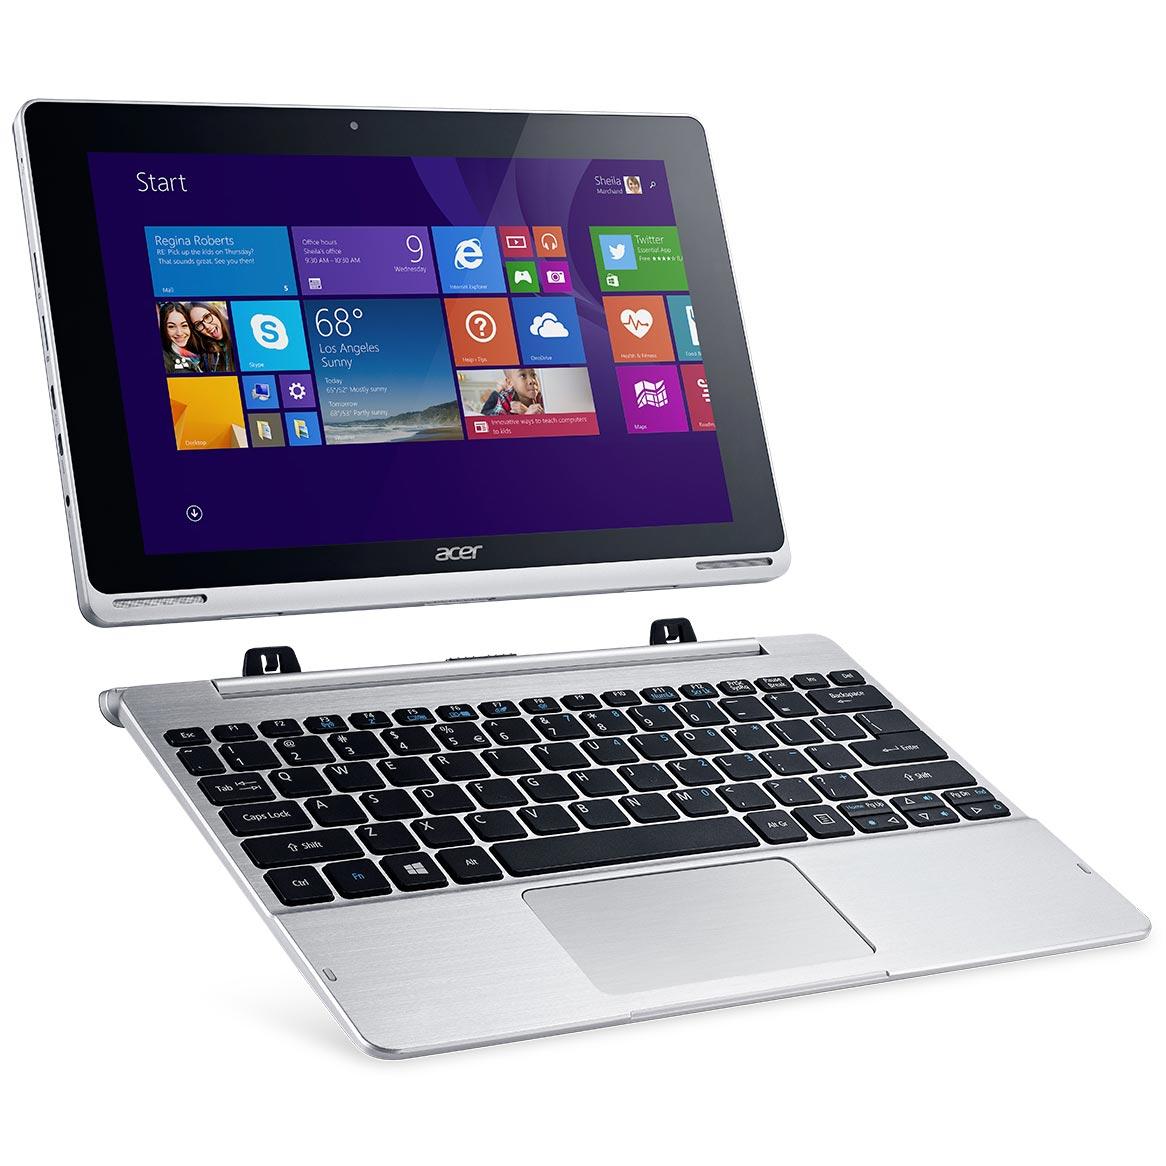 Acer aspire switch 10 sw5 012 14bm tablette tactile acer - Tablette tactile petit prix ...